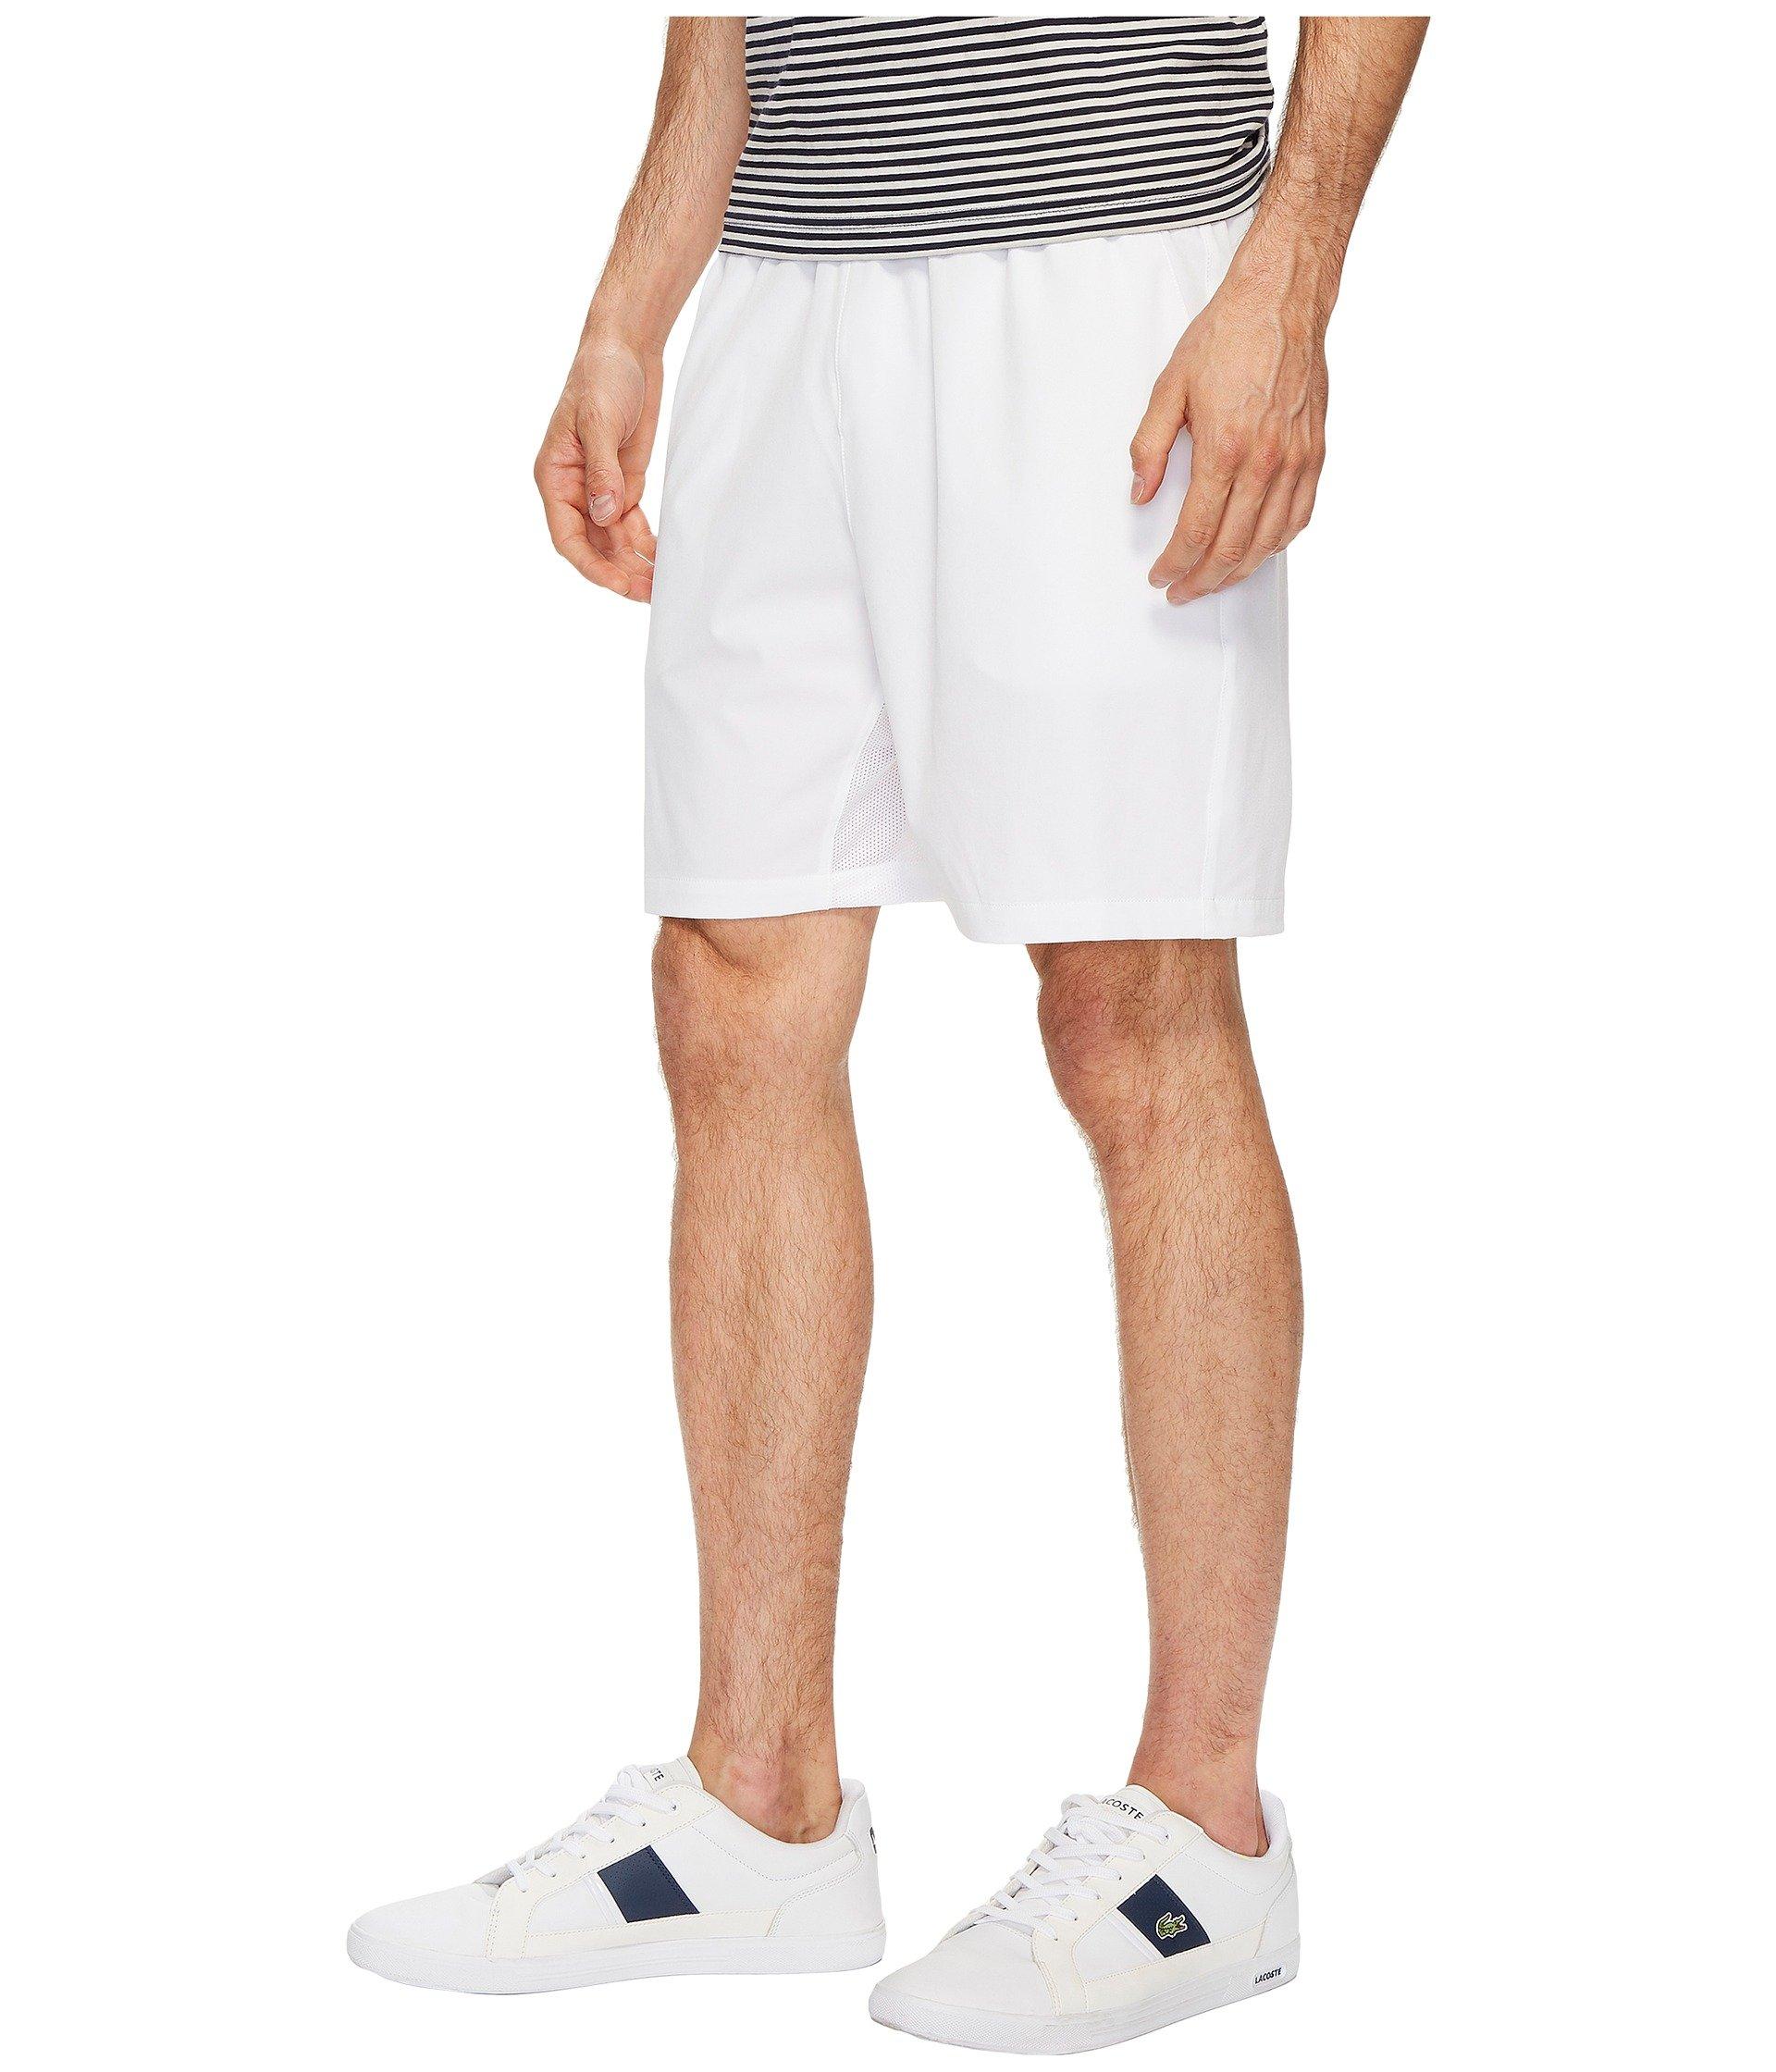 White Lacoste Stretch Lacoste Taffeta Stretch Shorts ncRTWBxcF